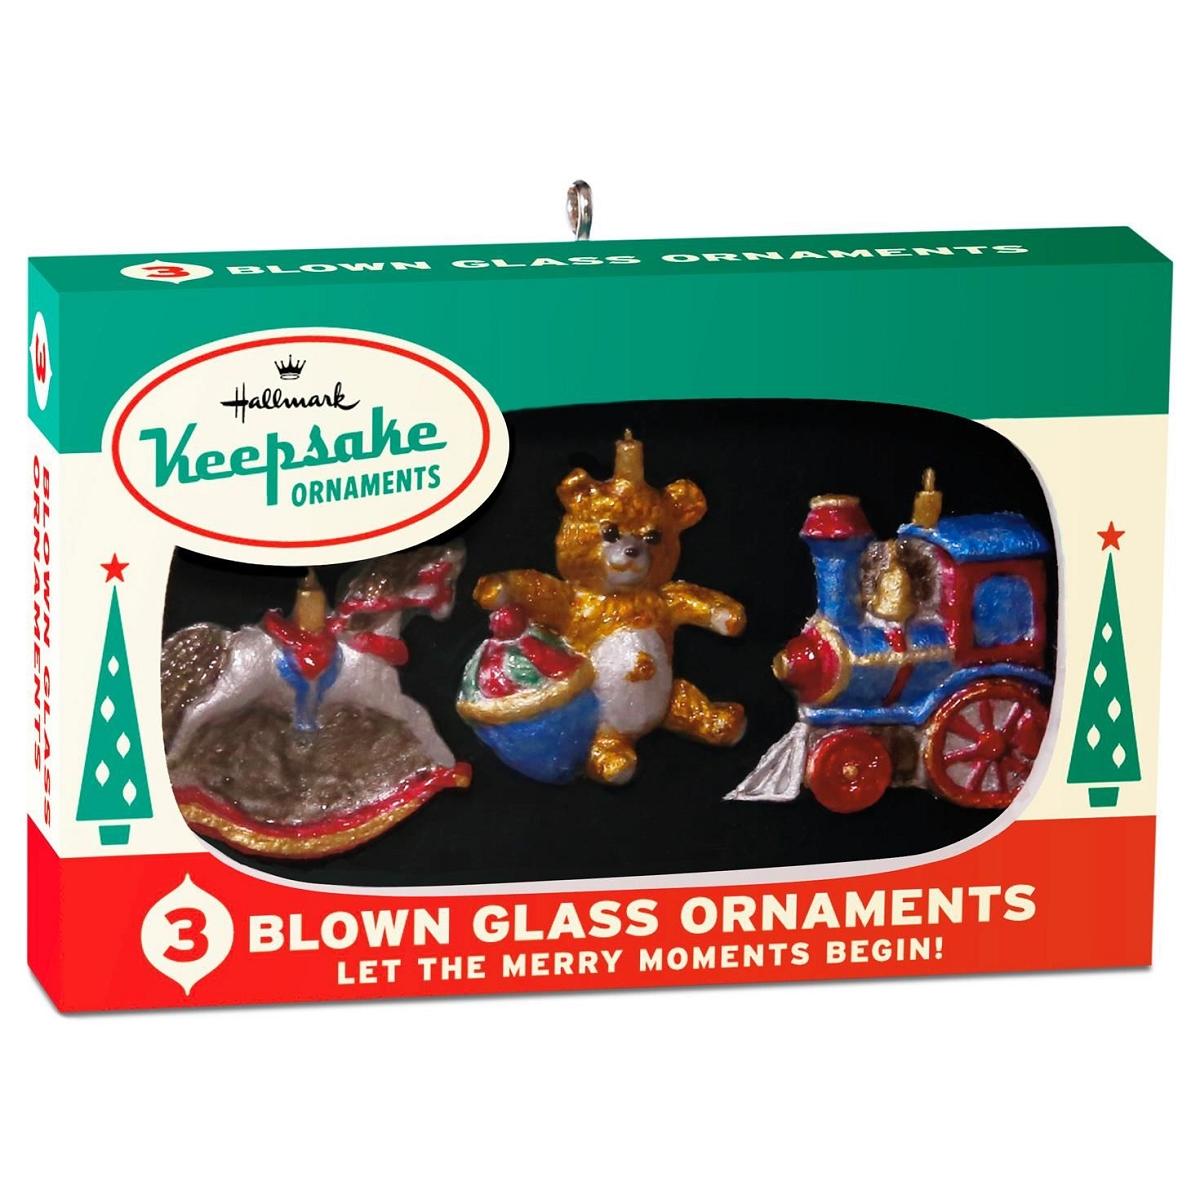 Hallmark Christmas Ornaments.2016 Nifty Fiftes Keepsake Ornaments Hallmark Keepsake Ornament Hooked On Hallmark Ornaments